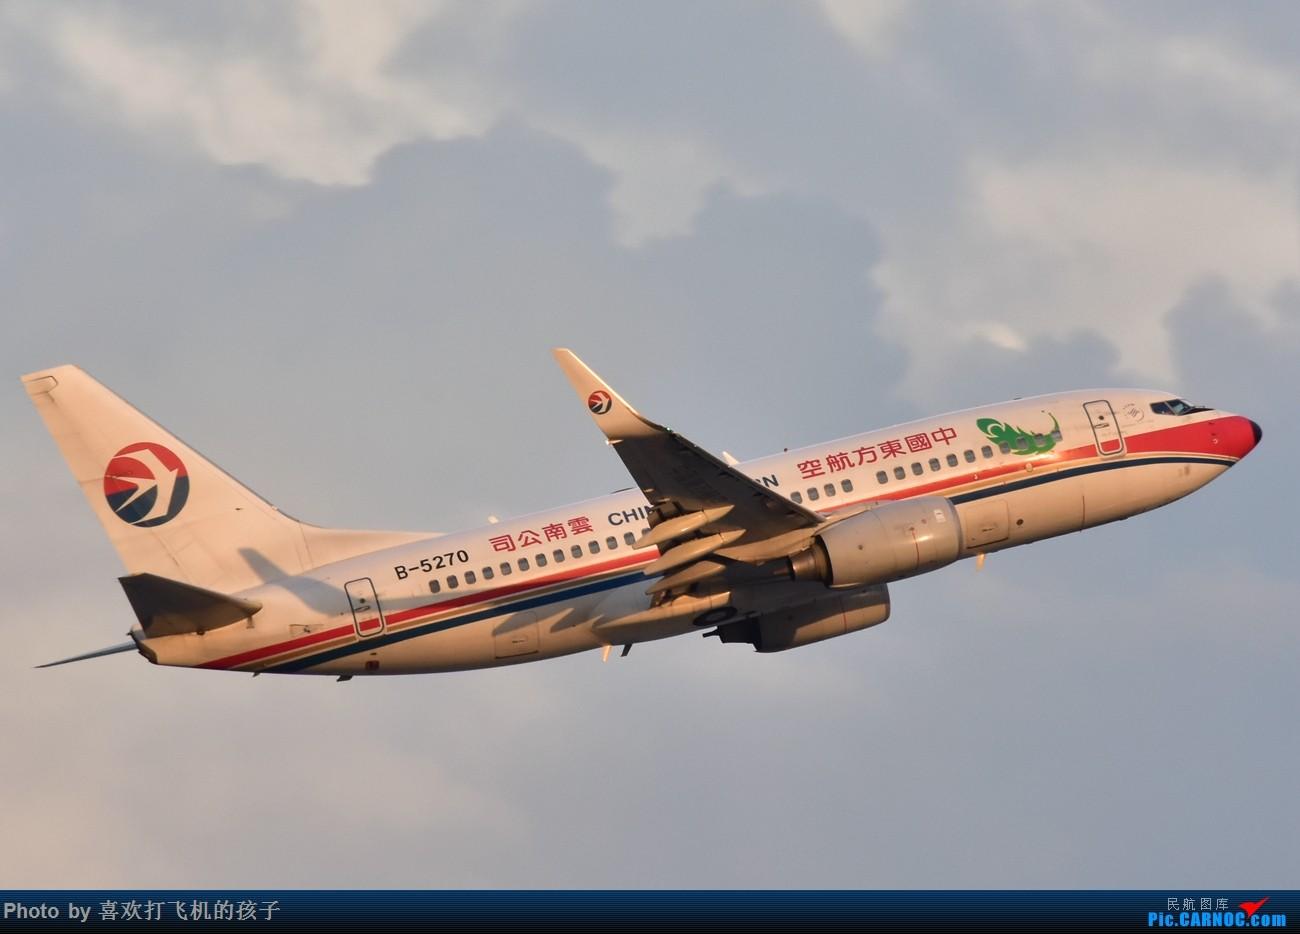 Re:[原创]【机机的飞飞】 与 @KMG木鱼 的长水半日闲 BOEING 737-700 B-5270 中国昆明长水国际机场